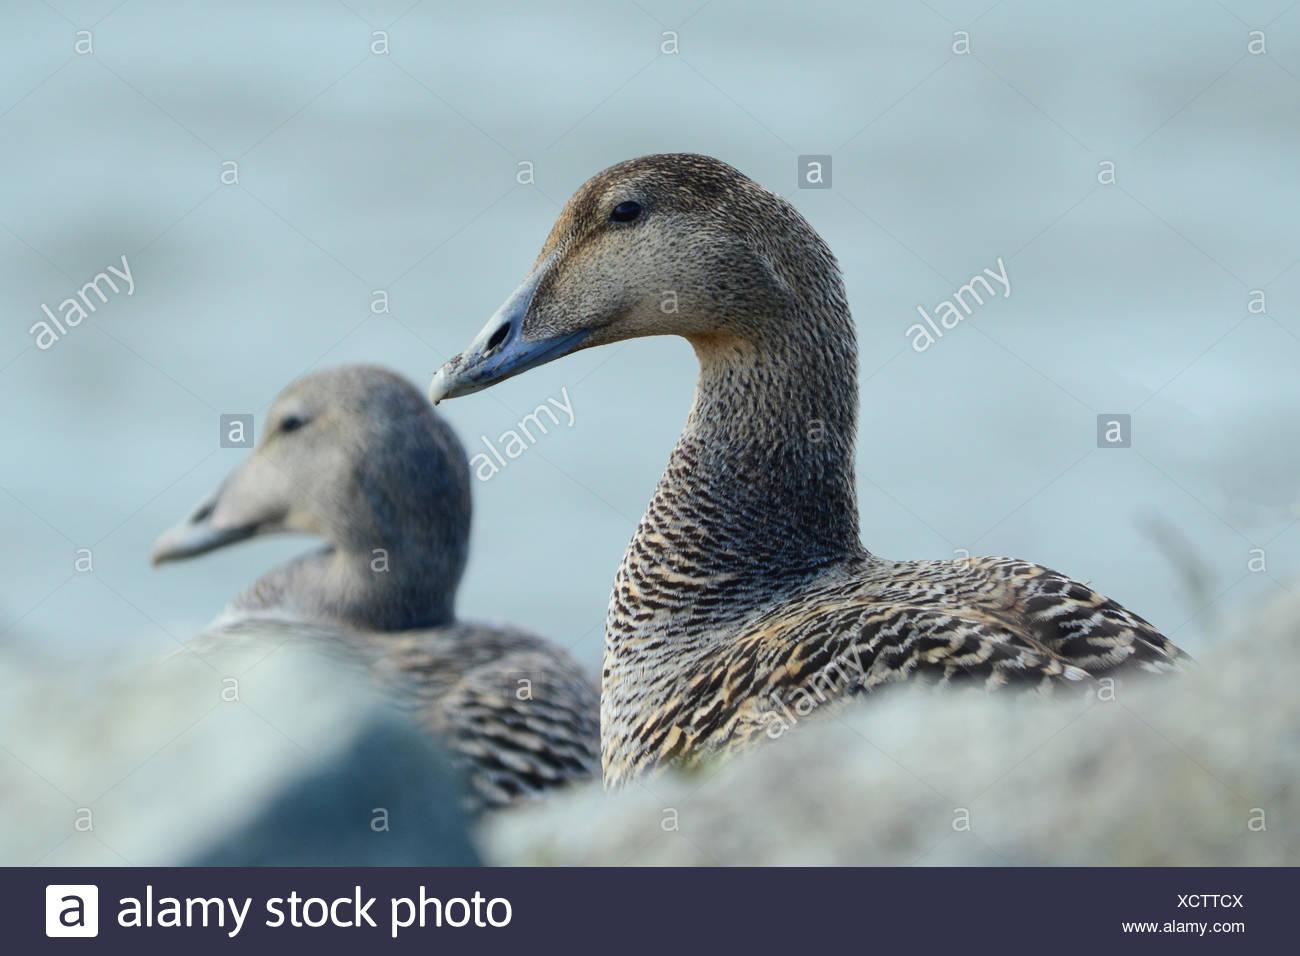 A female eider duck, Somateria mollissima. - Stock Image